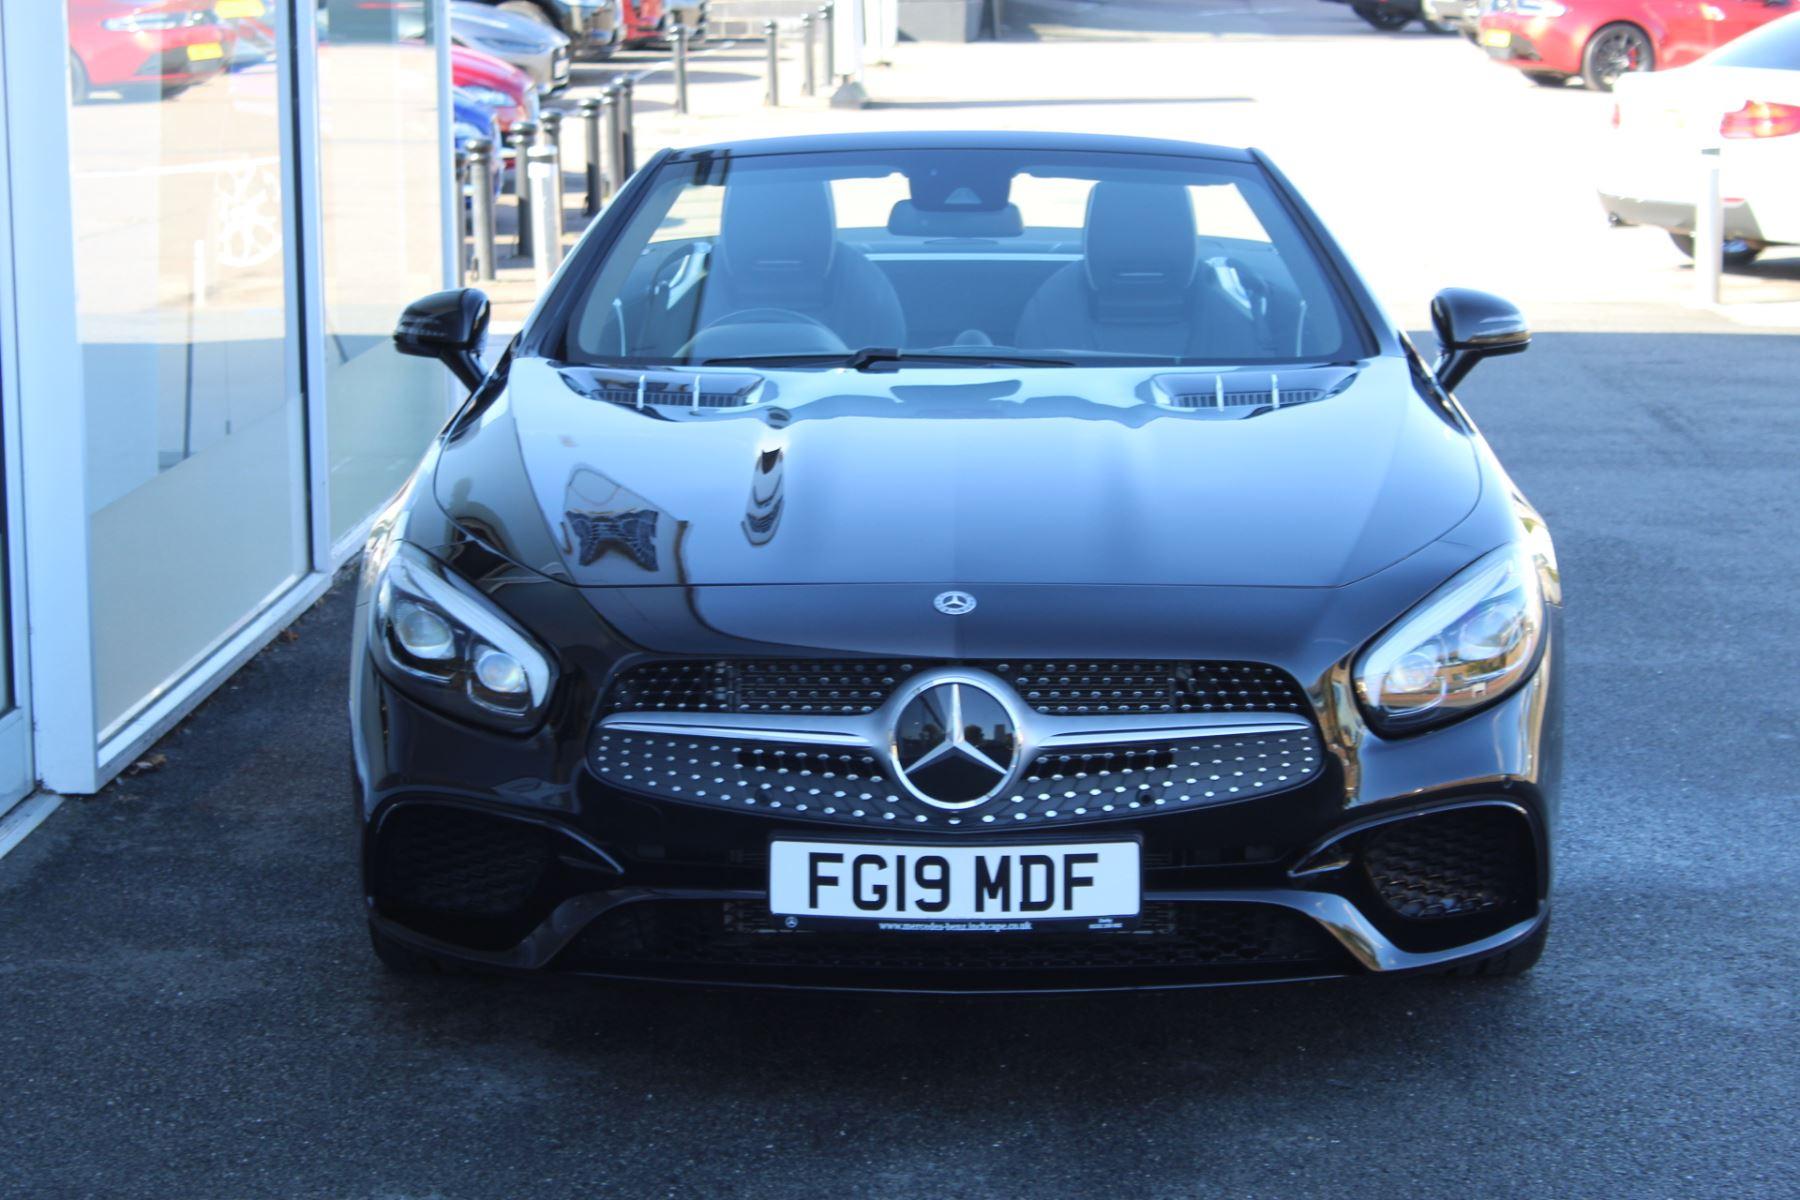 Mercedes-Benz SL SL 400 AMG Line Premium 2dr 9G-Tronic image 7